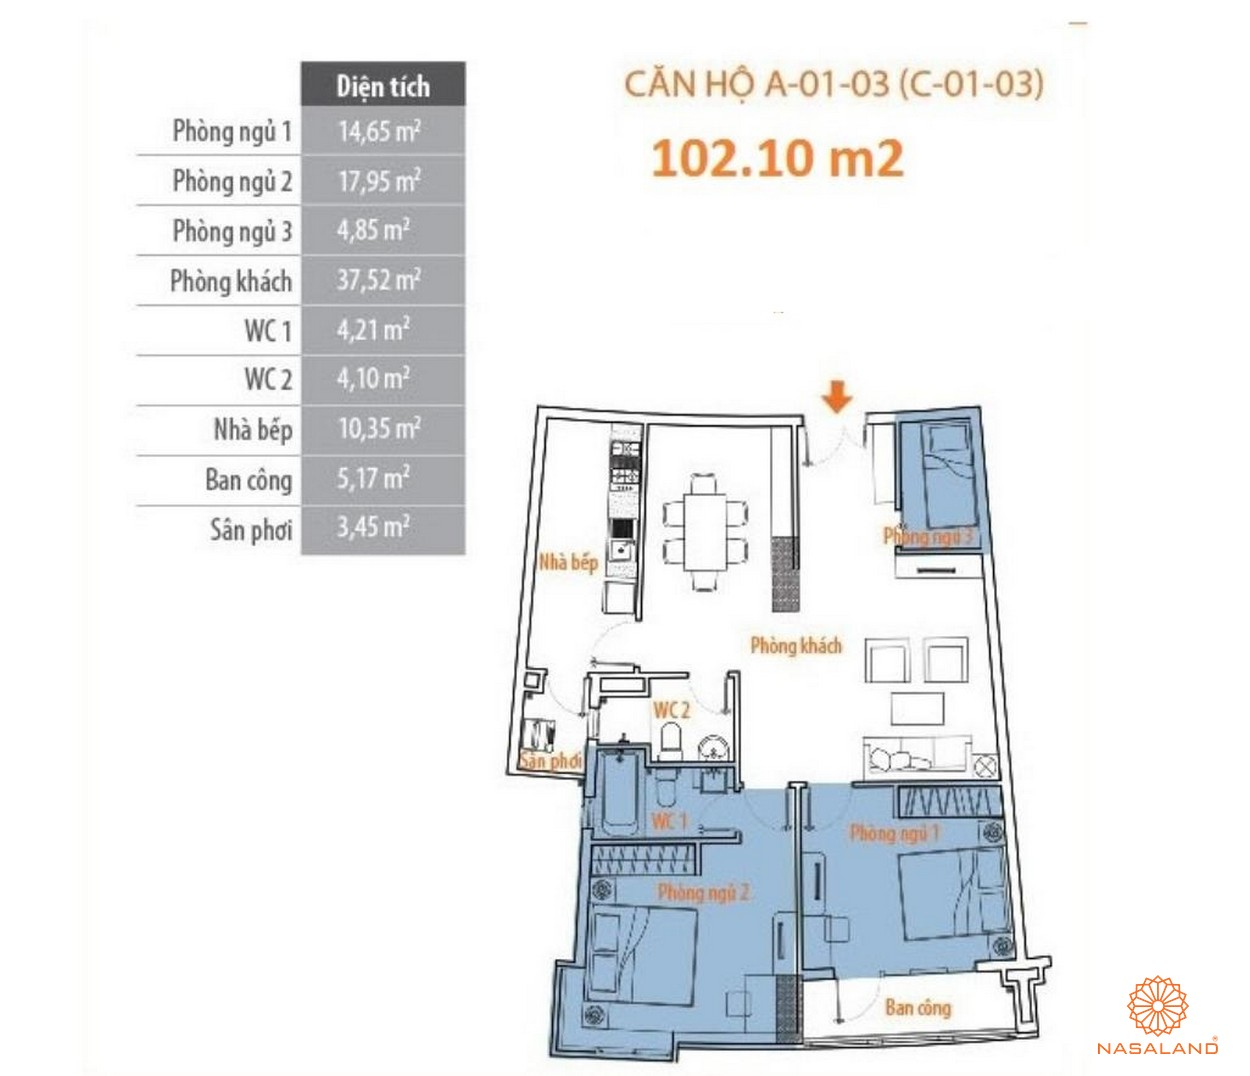 Thiết kế tổng quan căn hộ Him Lam Riverside quận 7 - block A căn số 03